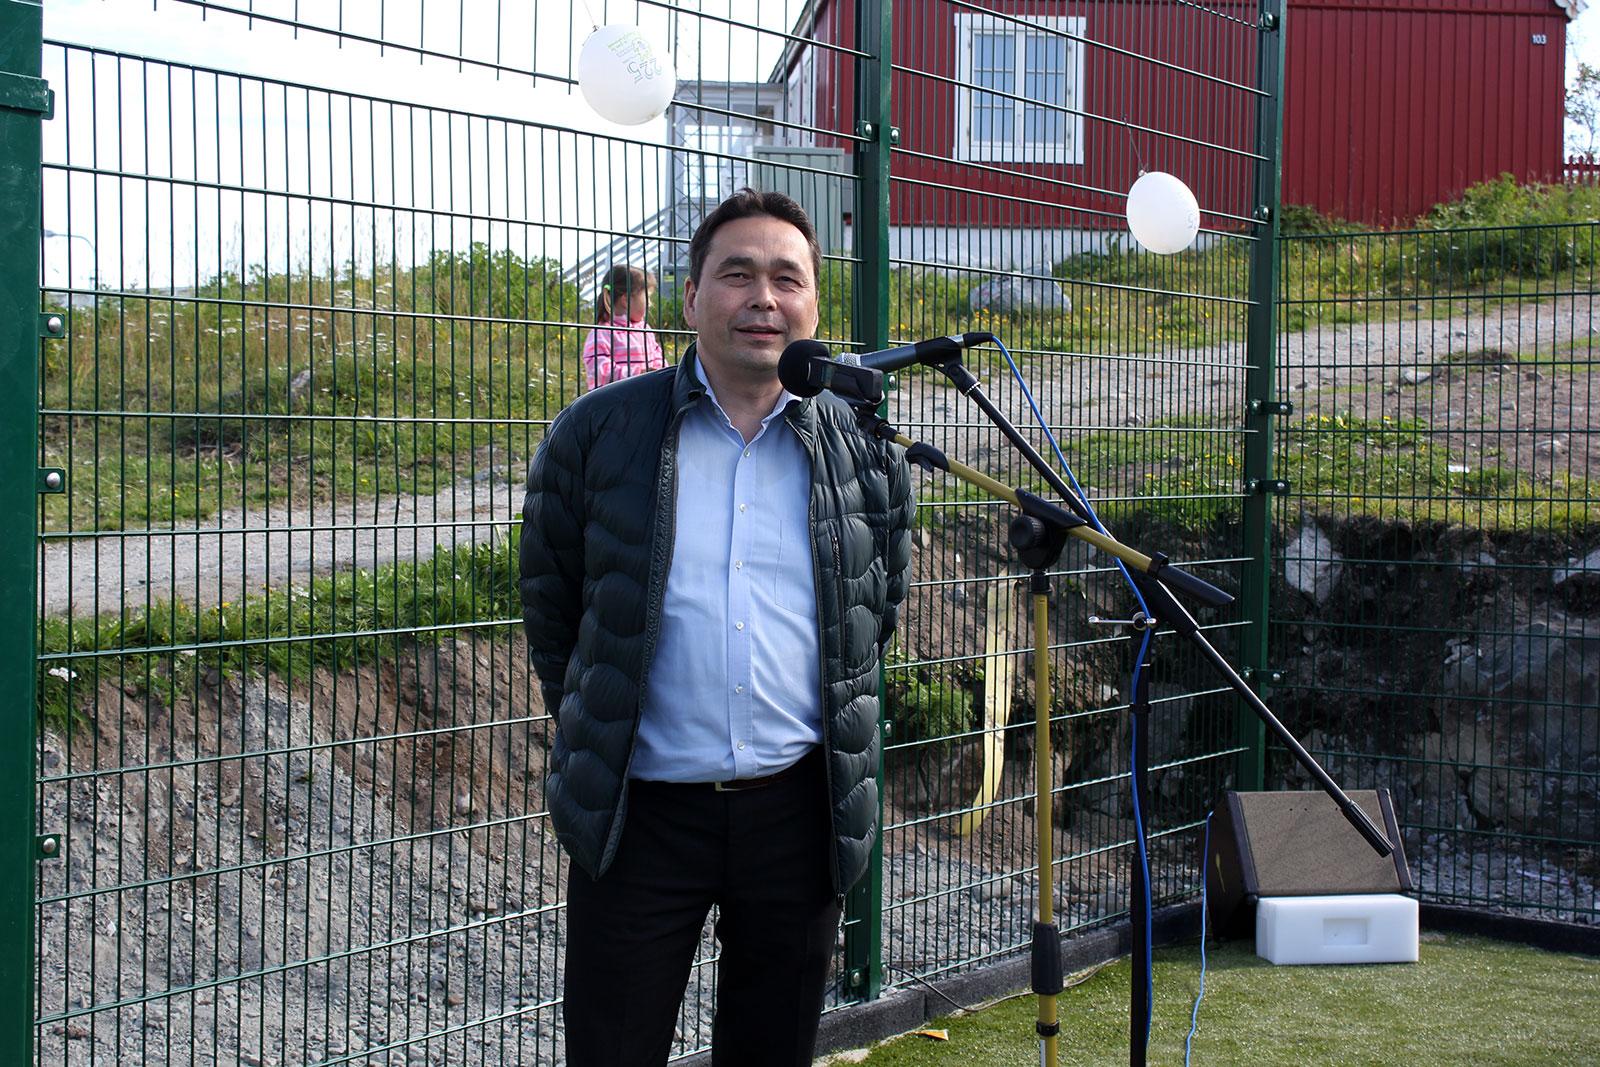 Wæver holder borgermøder om den nye trafikstruktur | Sermitsiaq.AG